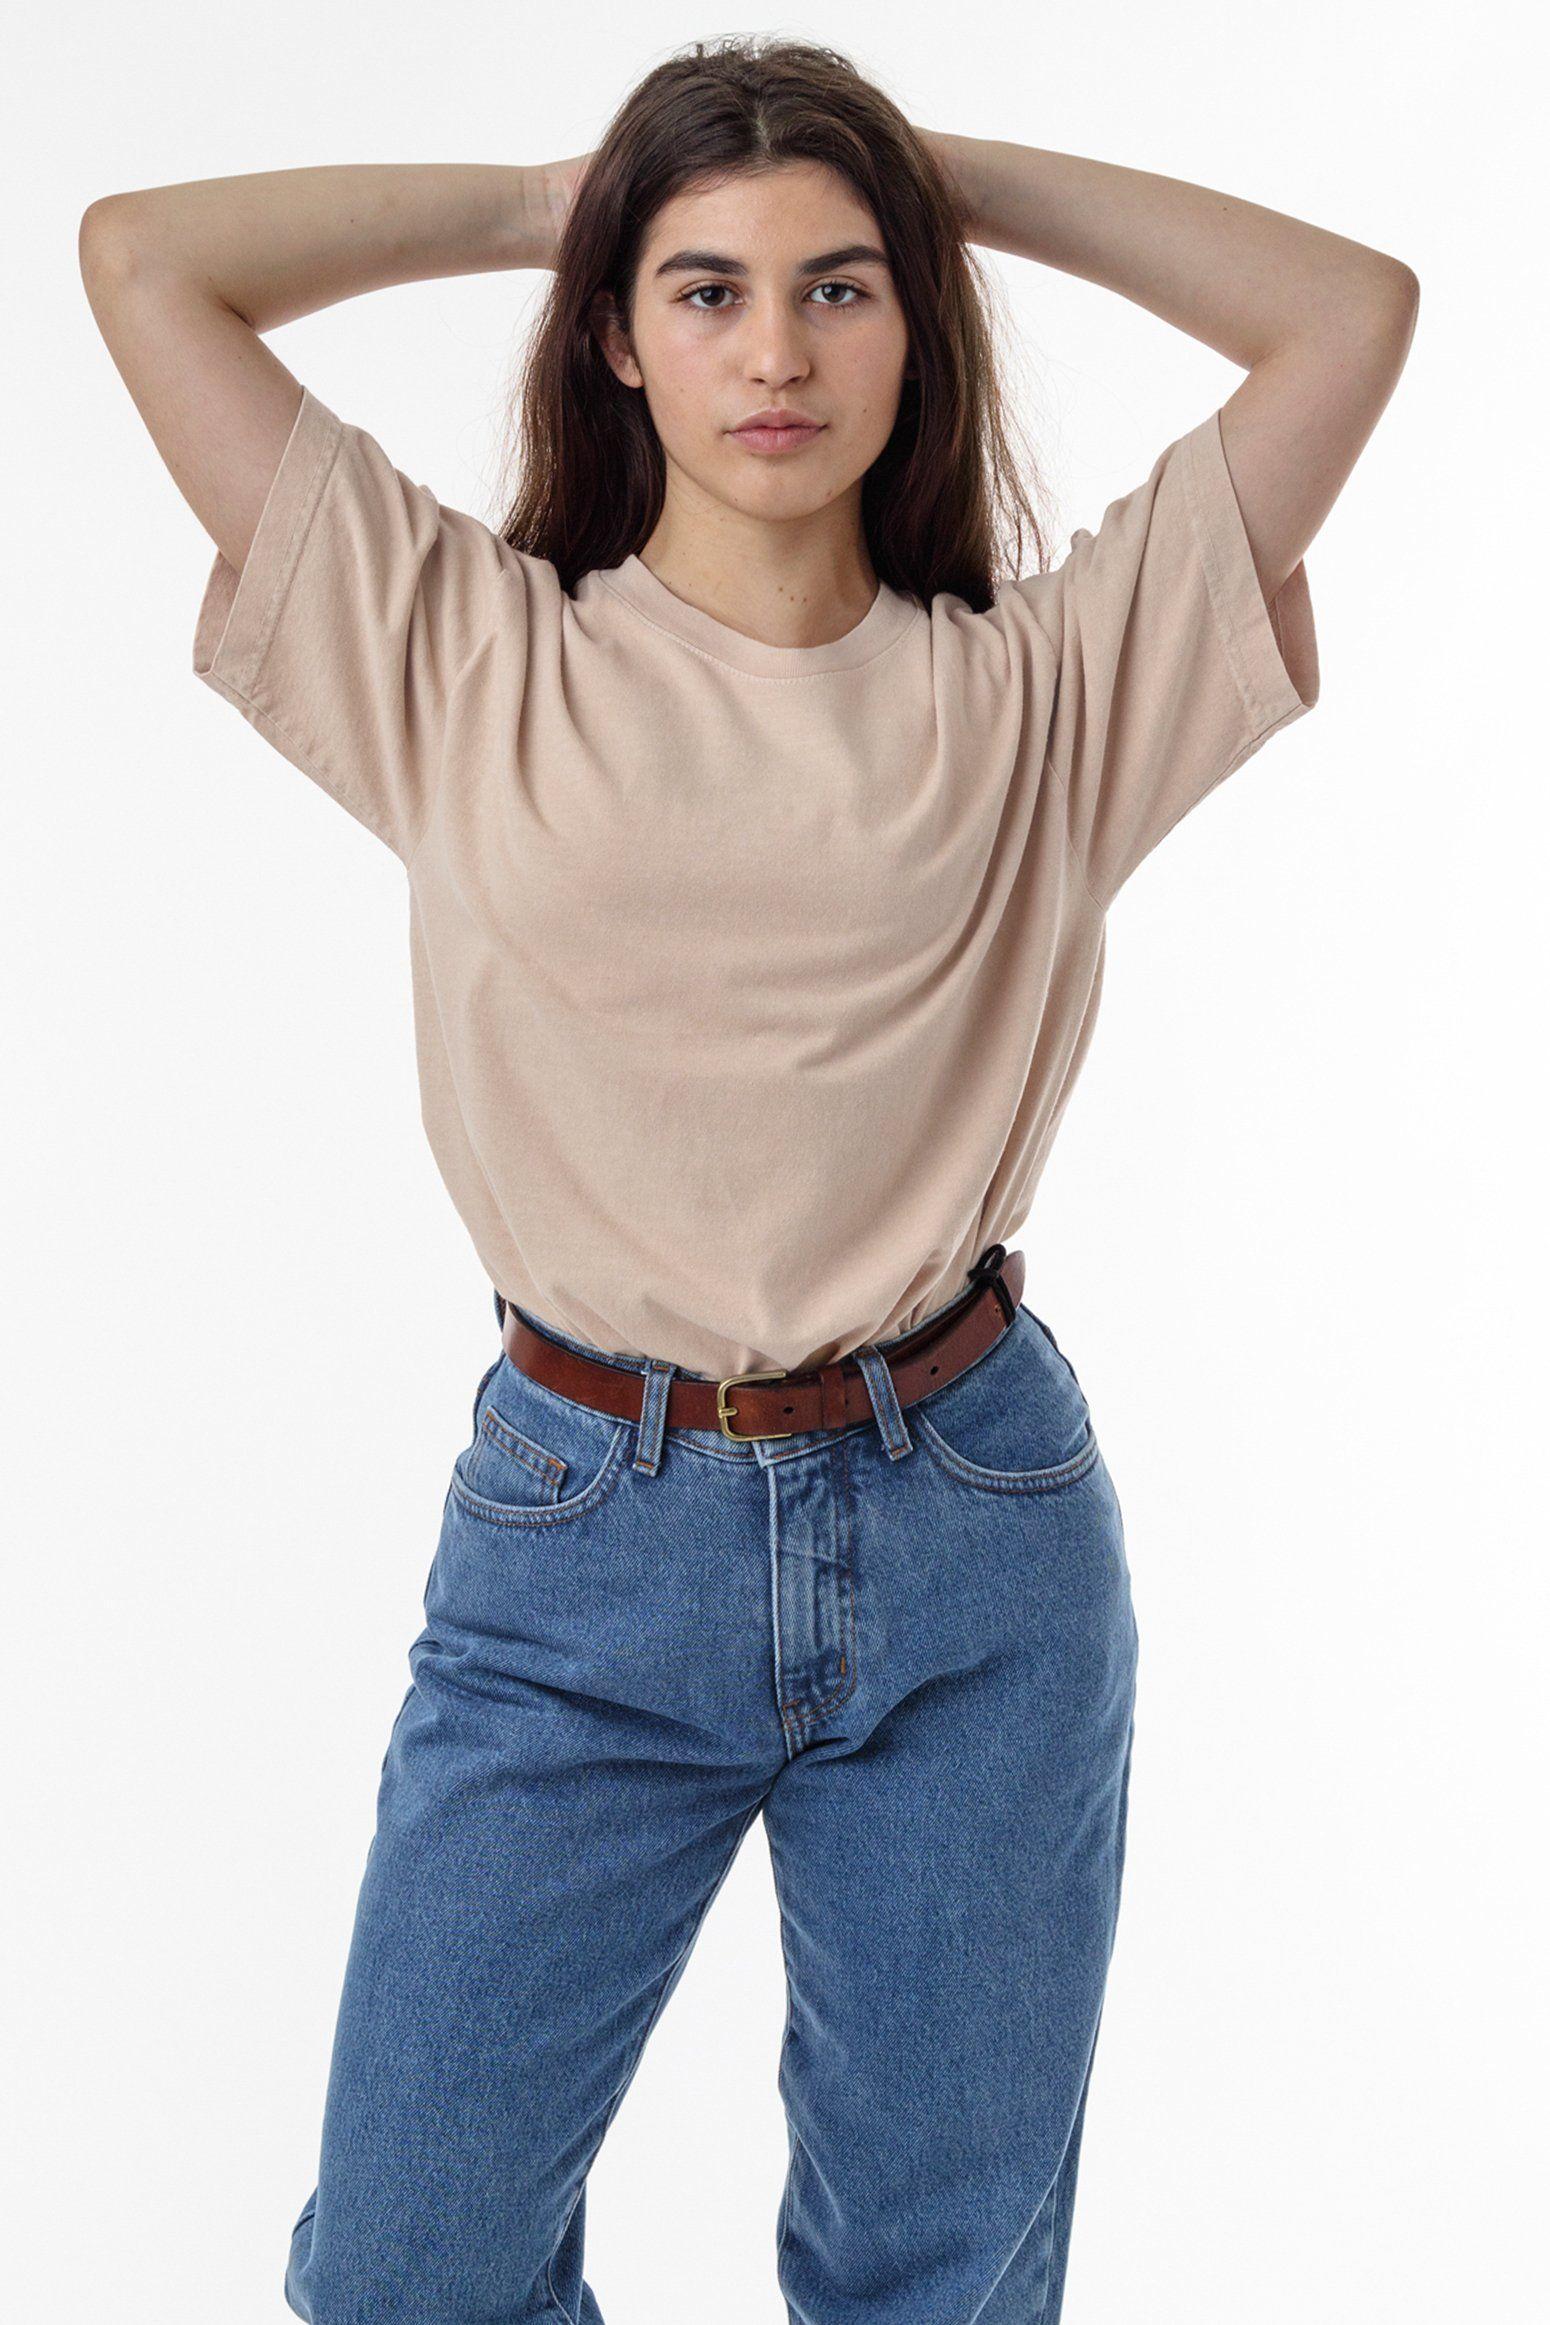 1801gd Unisex 6 5oz Garment Dye Pastel Crew Neck T Shirt Beige T Shirts Garment Dye Tshirt Outfit Summer